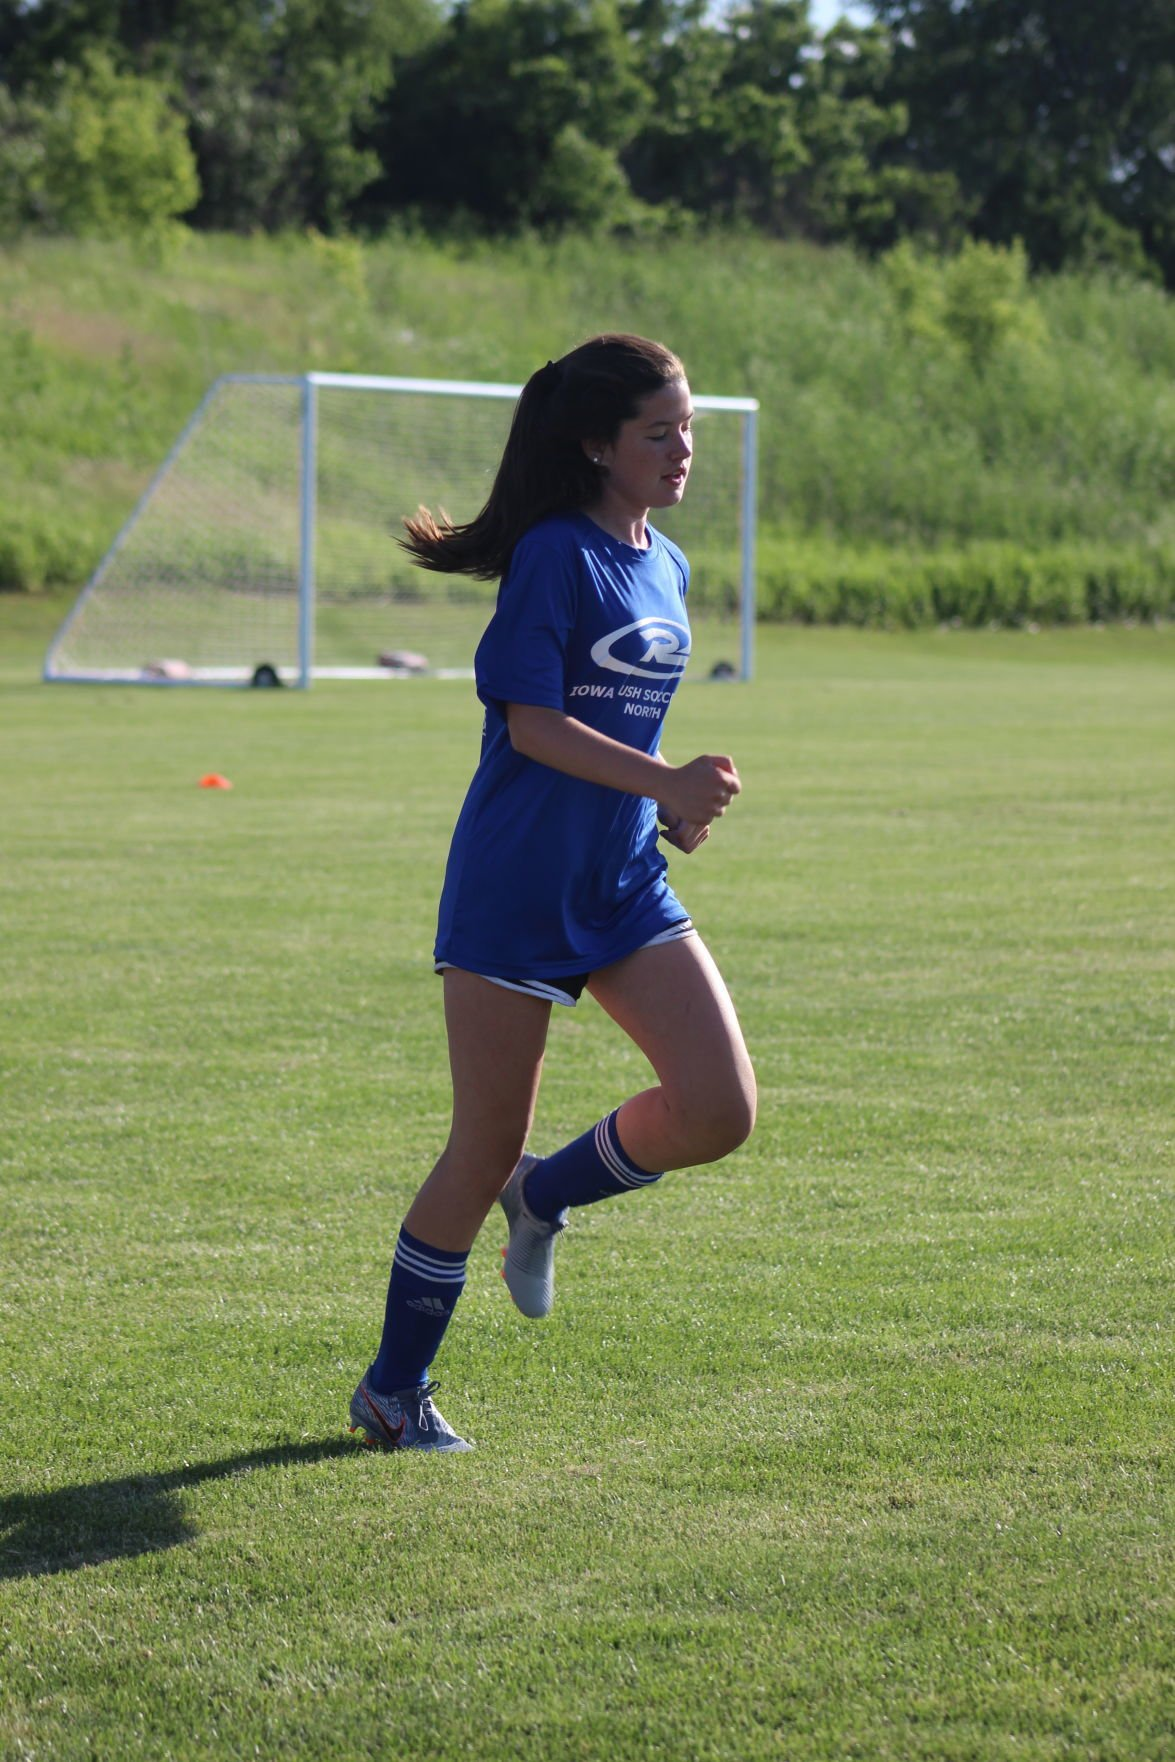 Natalie Burman